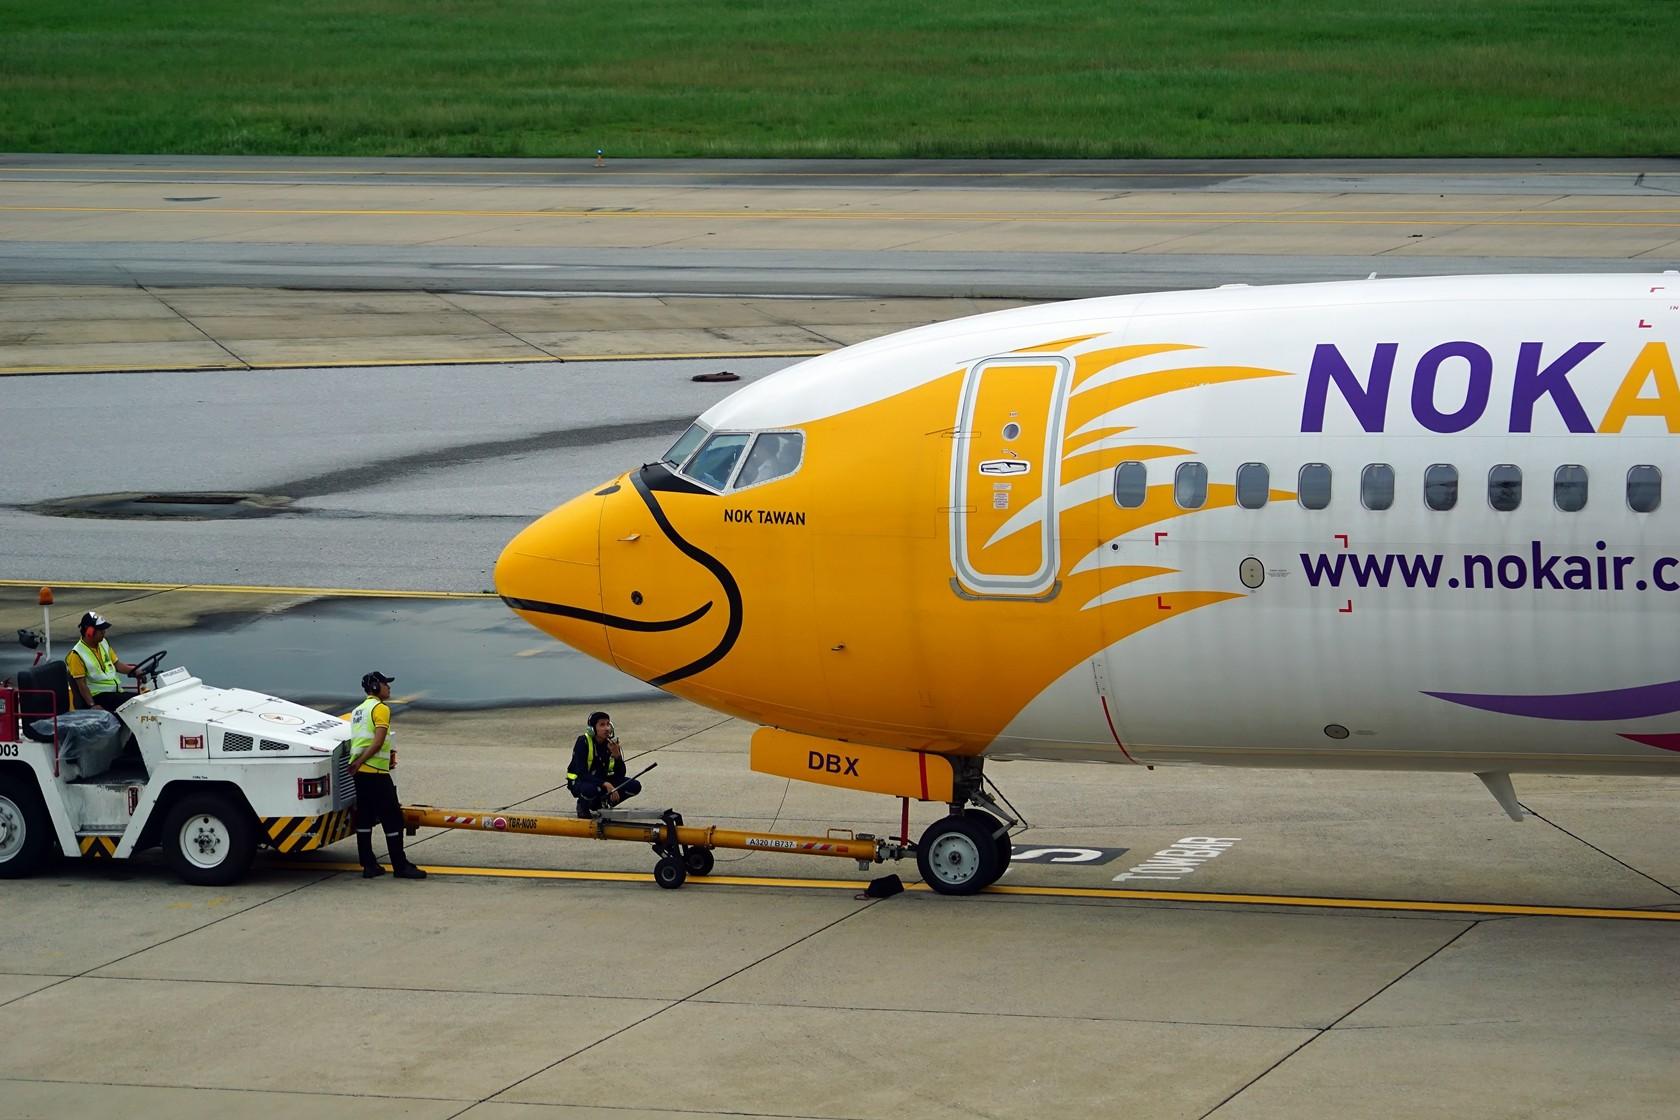 Re:[原创]nokaie 皇雀航空 不说别的 就问你萌不萌 BOEING 737-800 HS-DBX 泰国曼谷廊曼国际机场